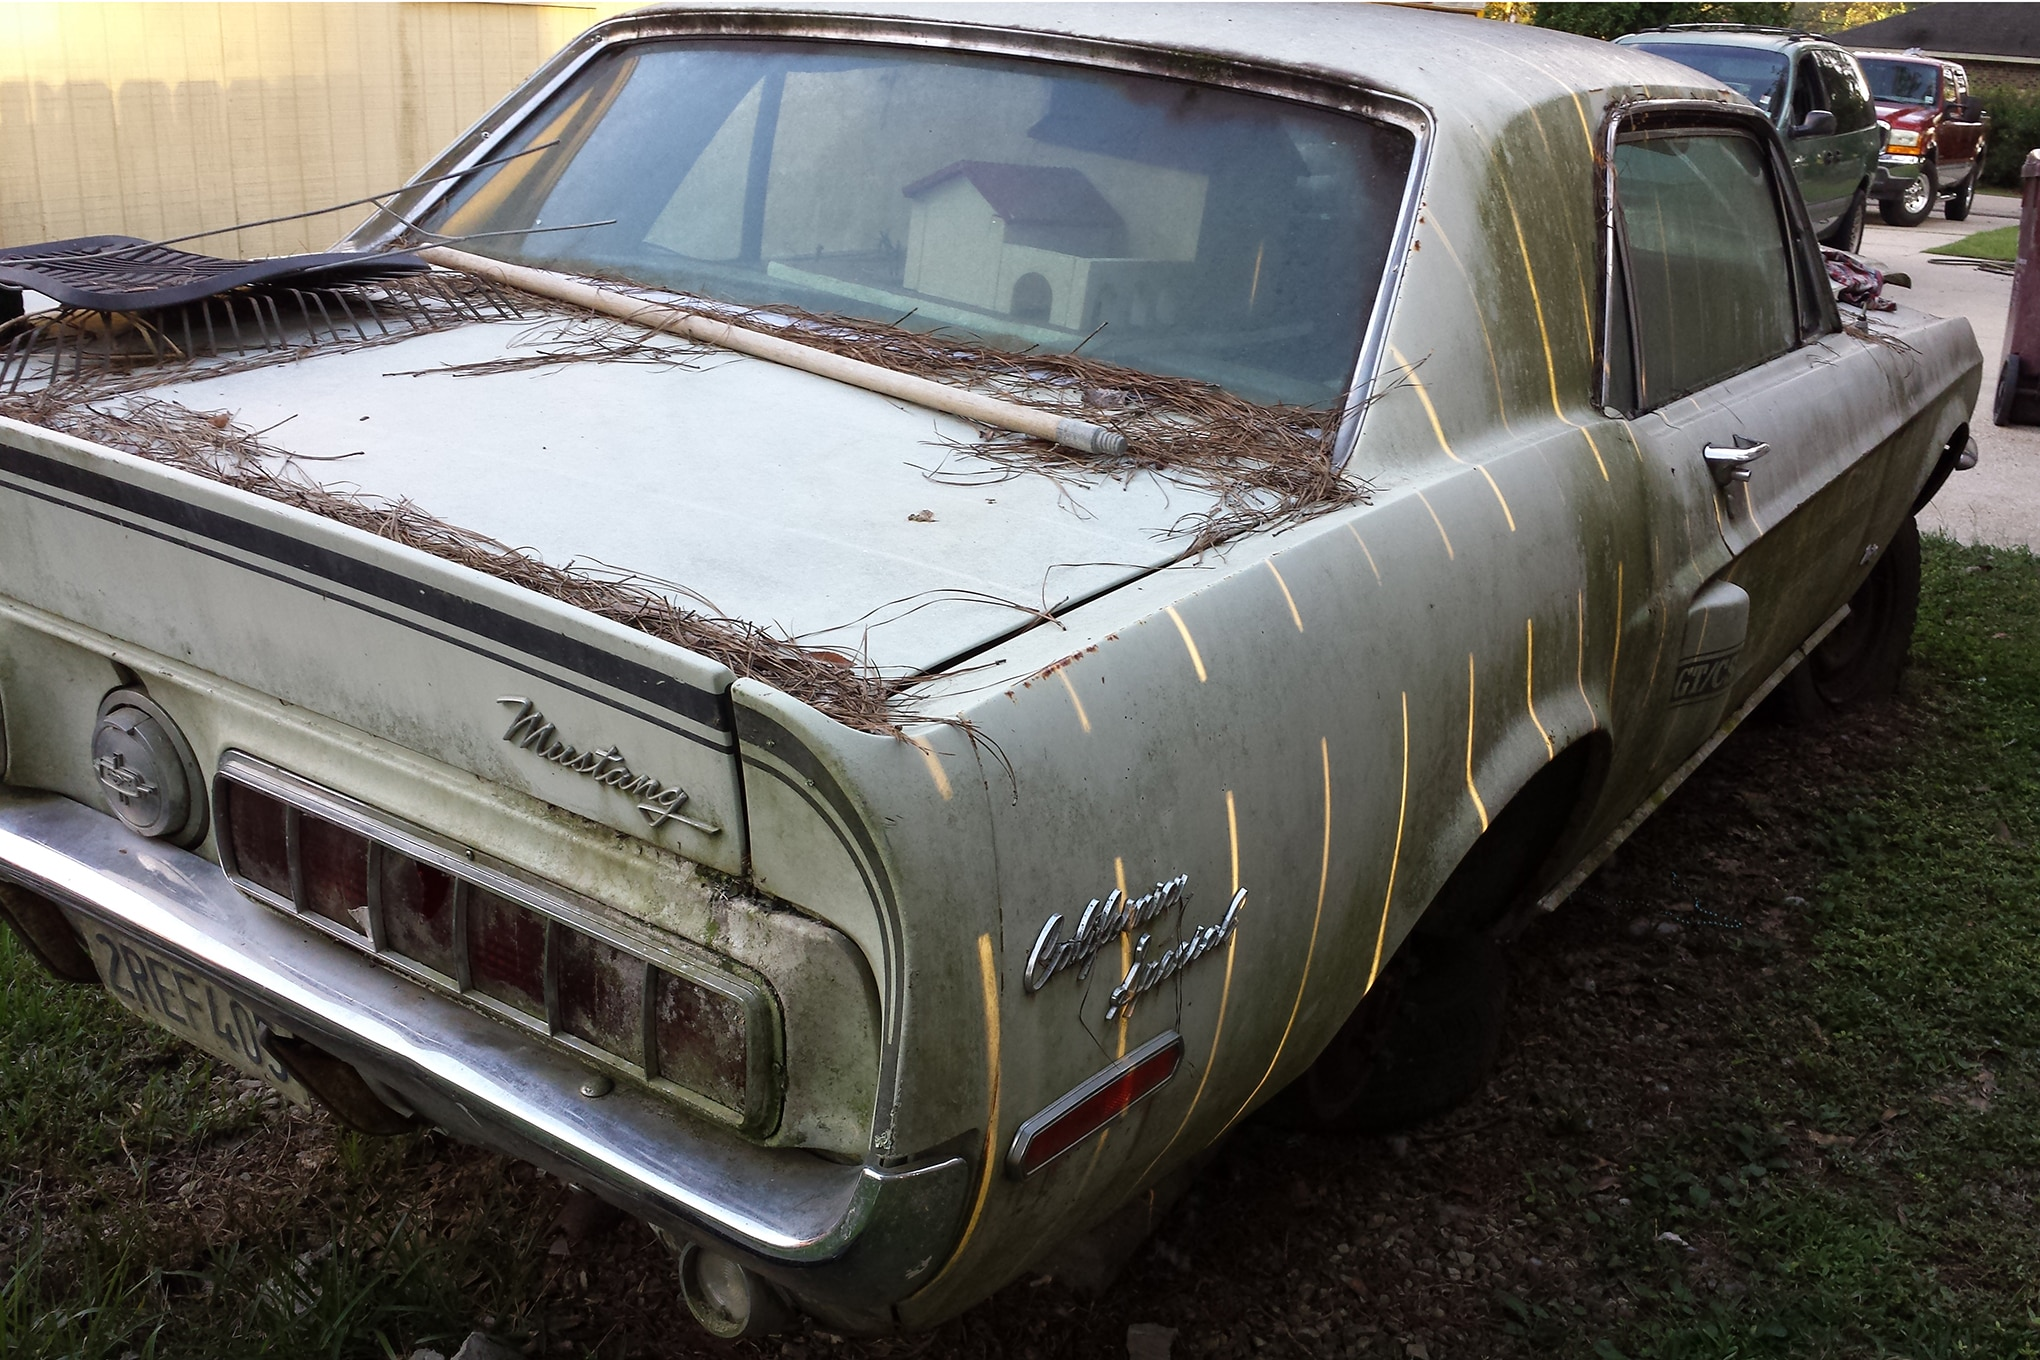 002 RareFinds 1968 CaliforniaSpecial Heasley